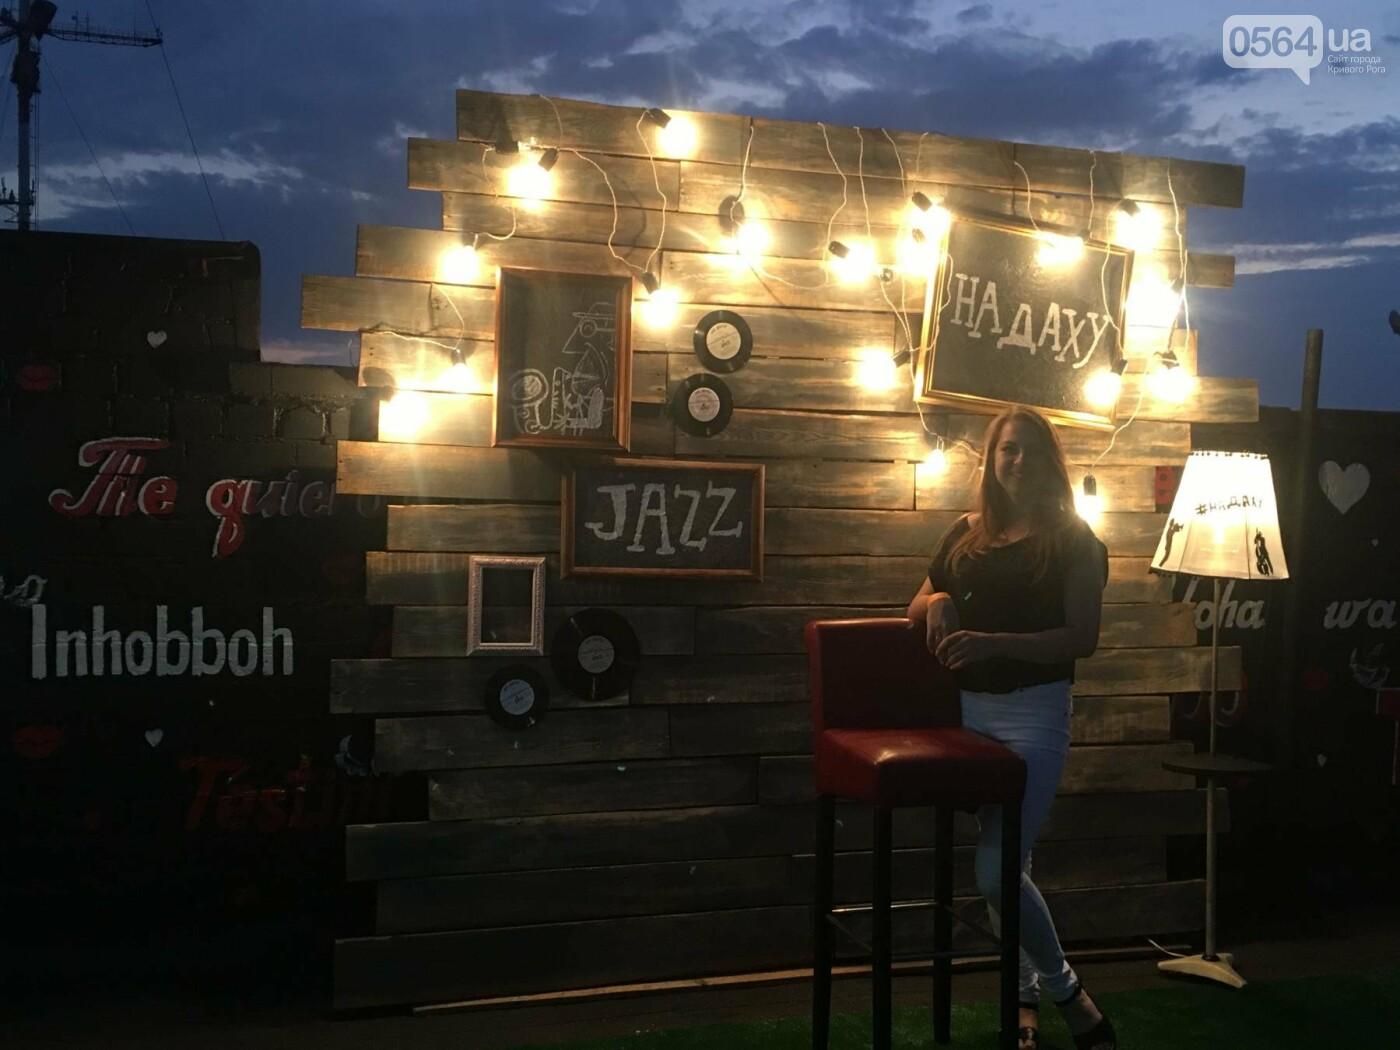 Сотни криворожан встречали закат на крыше отеля под мелодии джаза, - ФОТО, ВИДЕО, фото-26